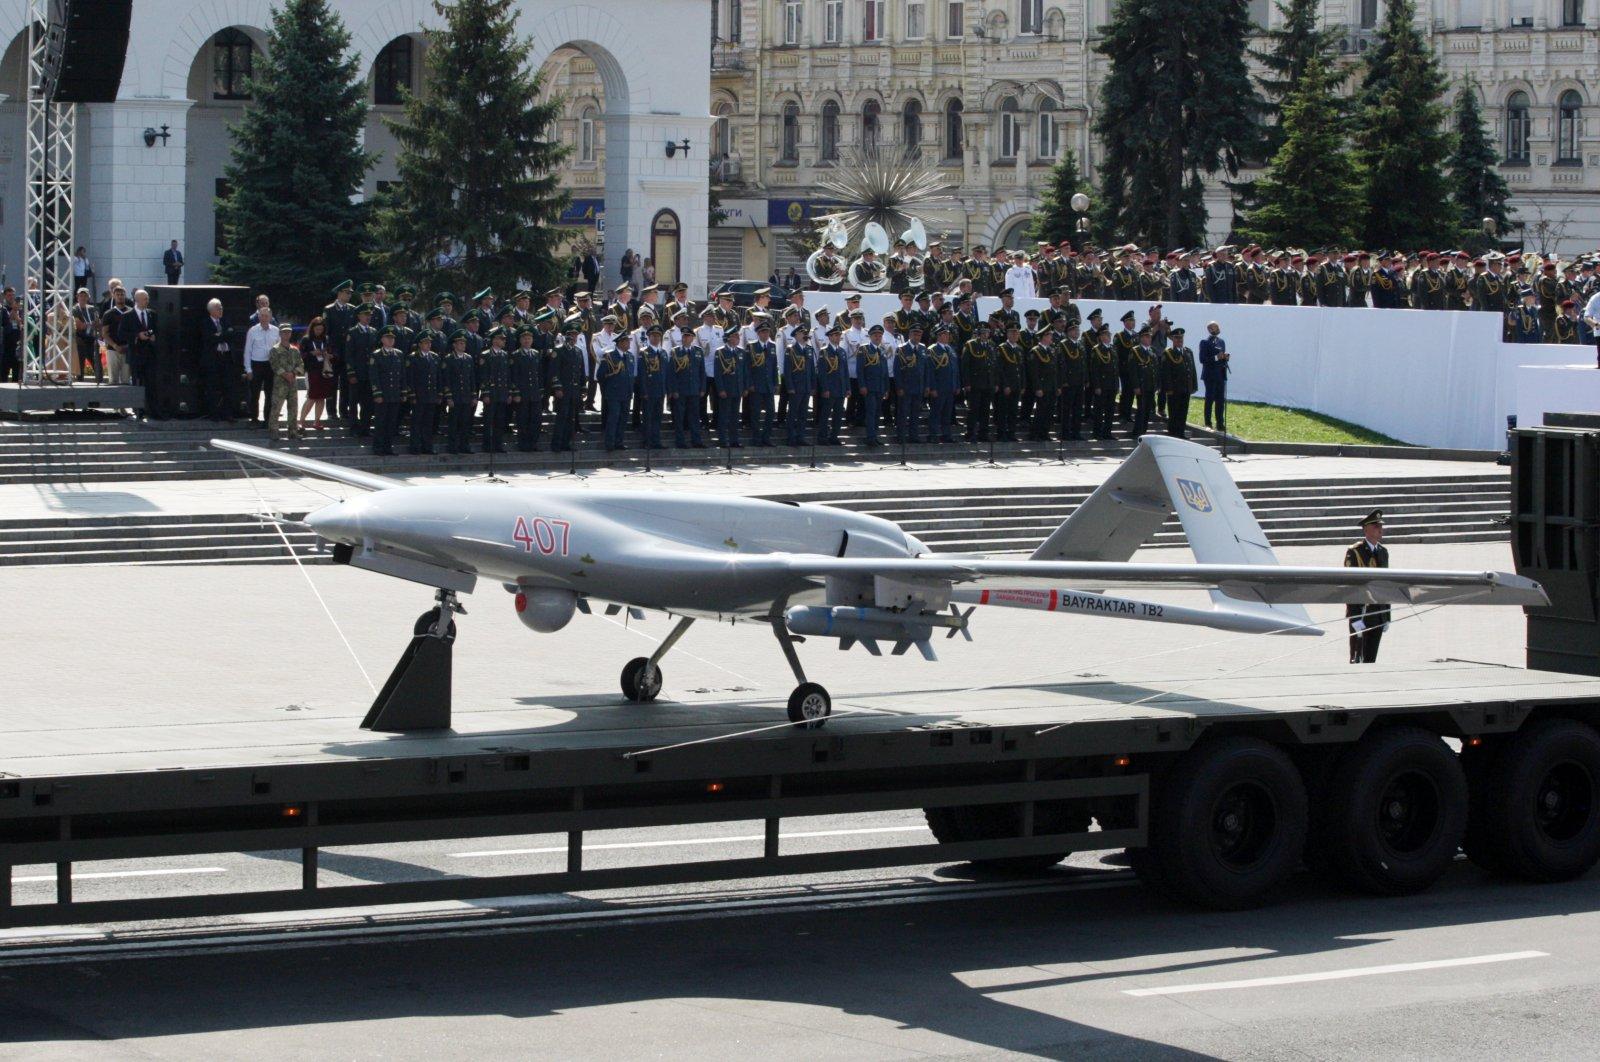 A Bayraktar TB2 UCAV belonging to the Ukrainian army on display during a military parade in Kyiv, Ukraine, Aug. 24, 2021. (AA Photo)